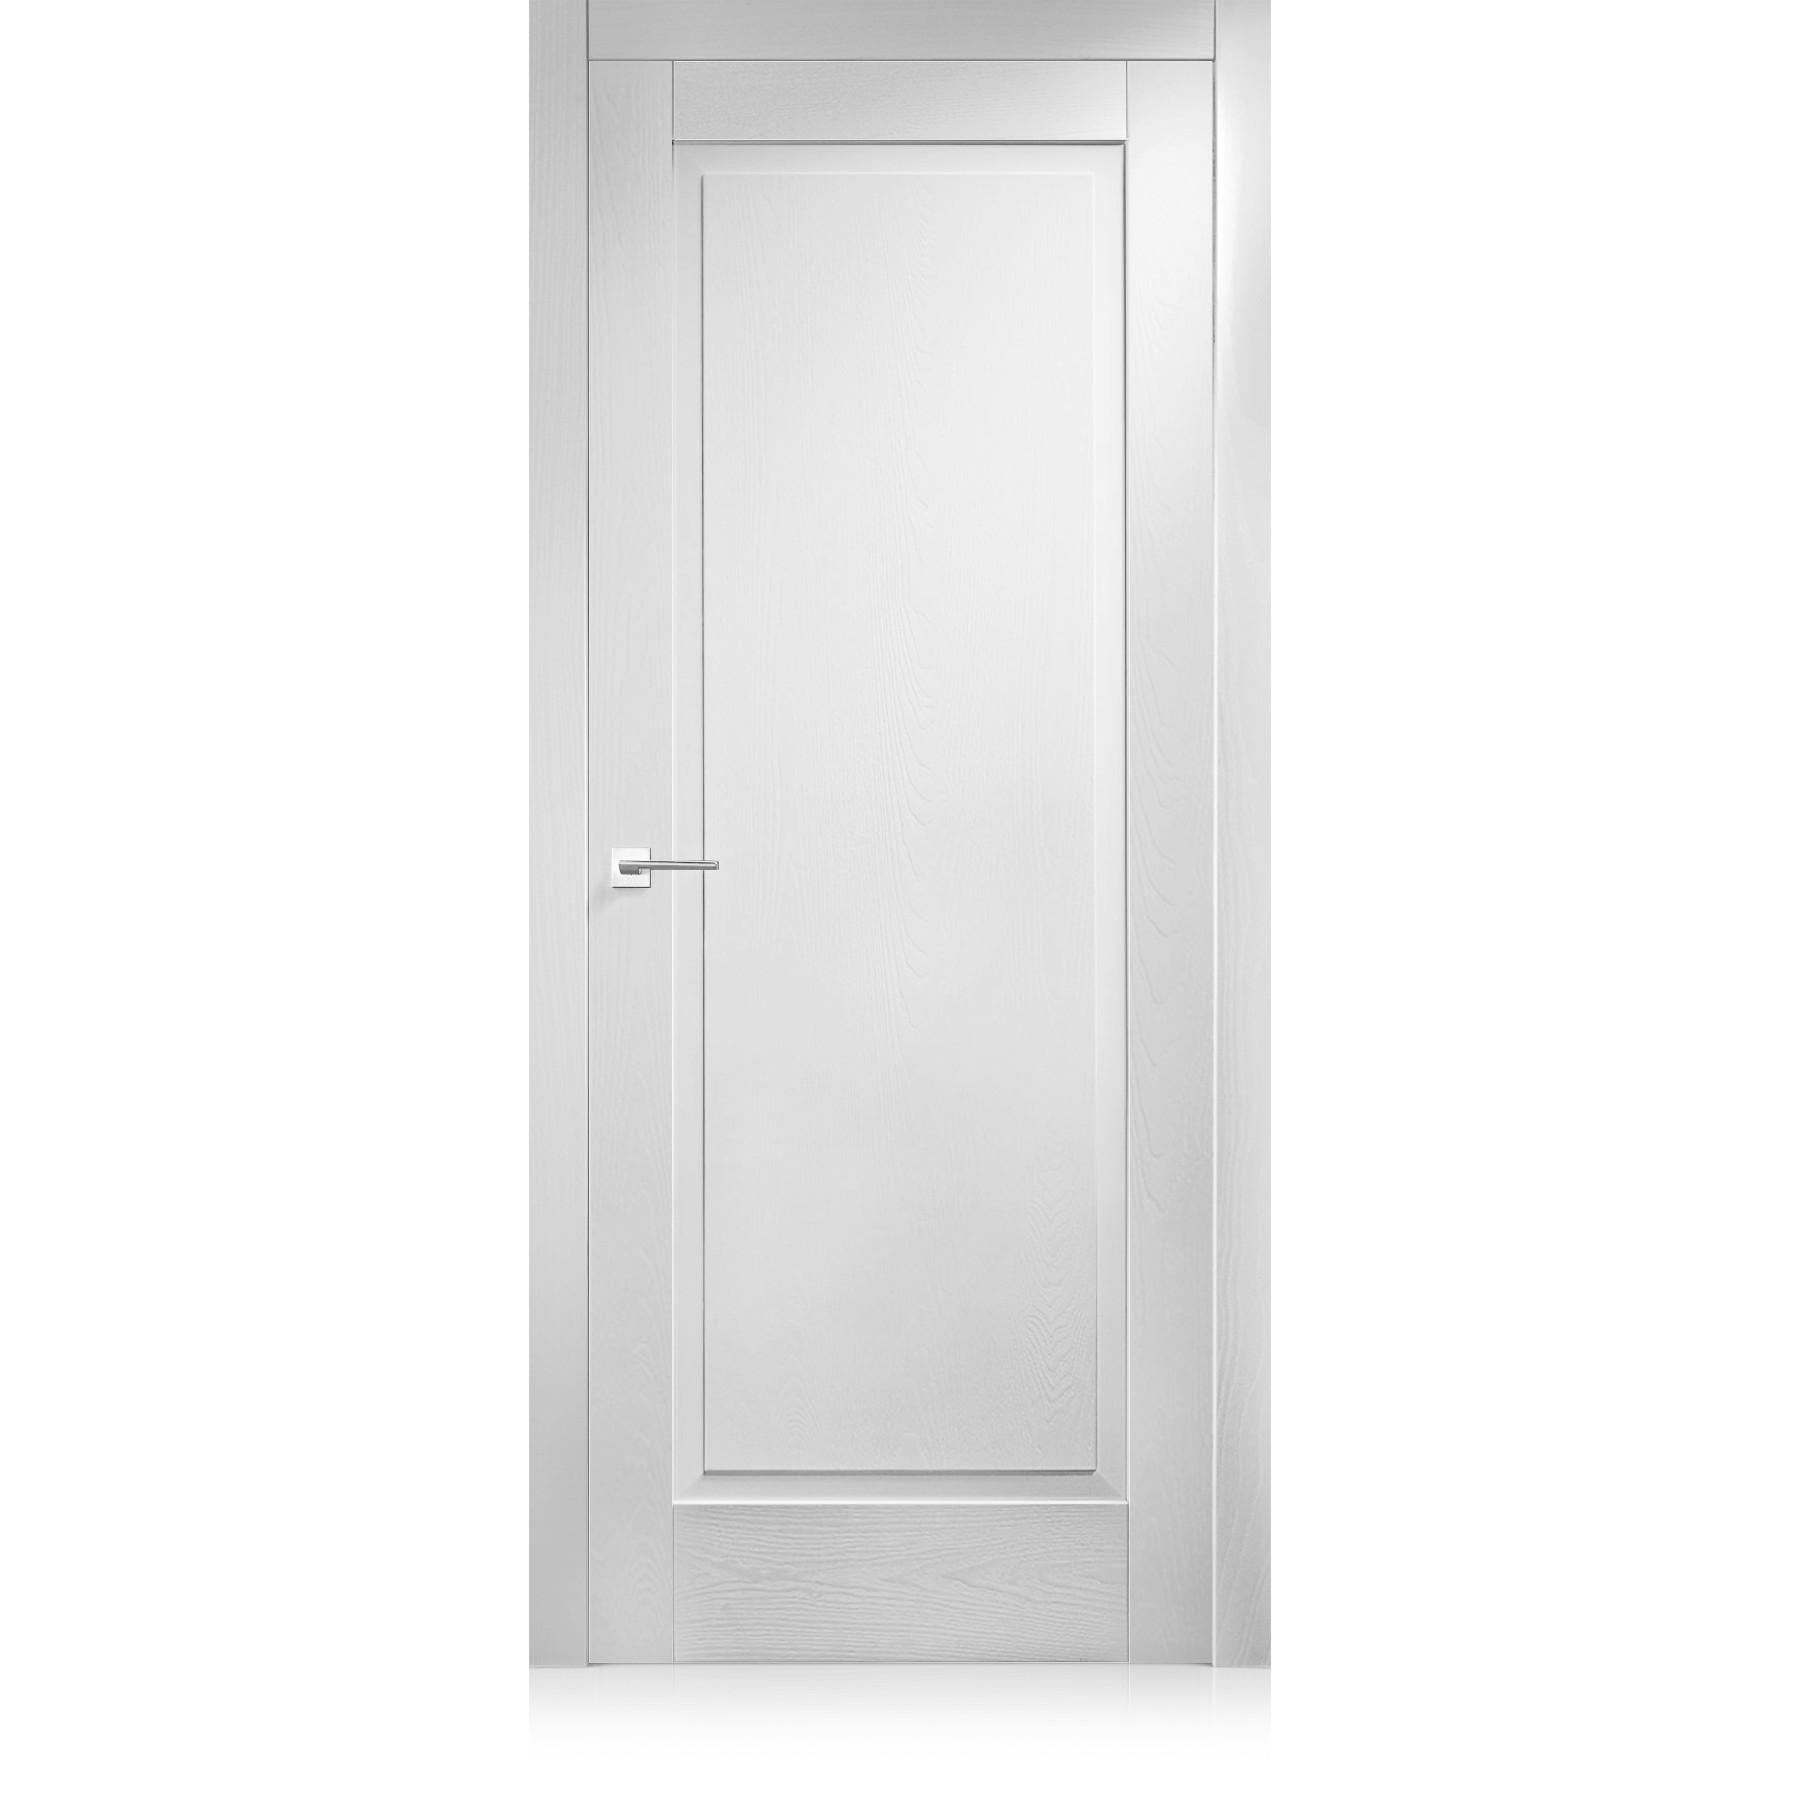 Tür Suite / 21 trame bianco